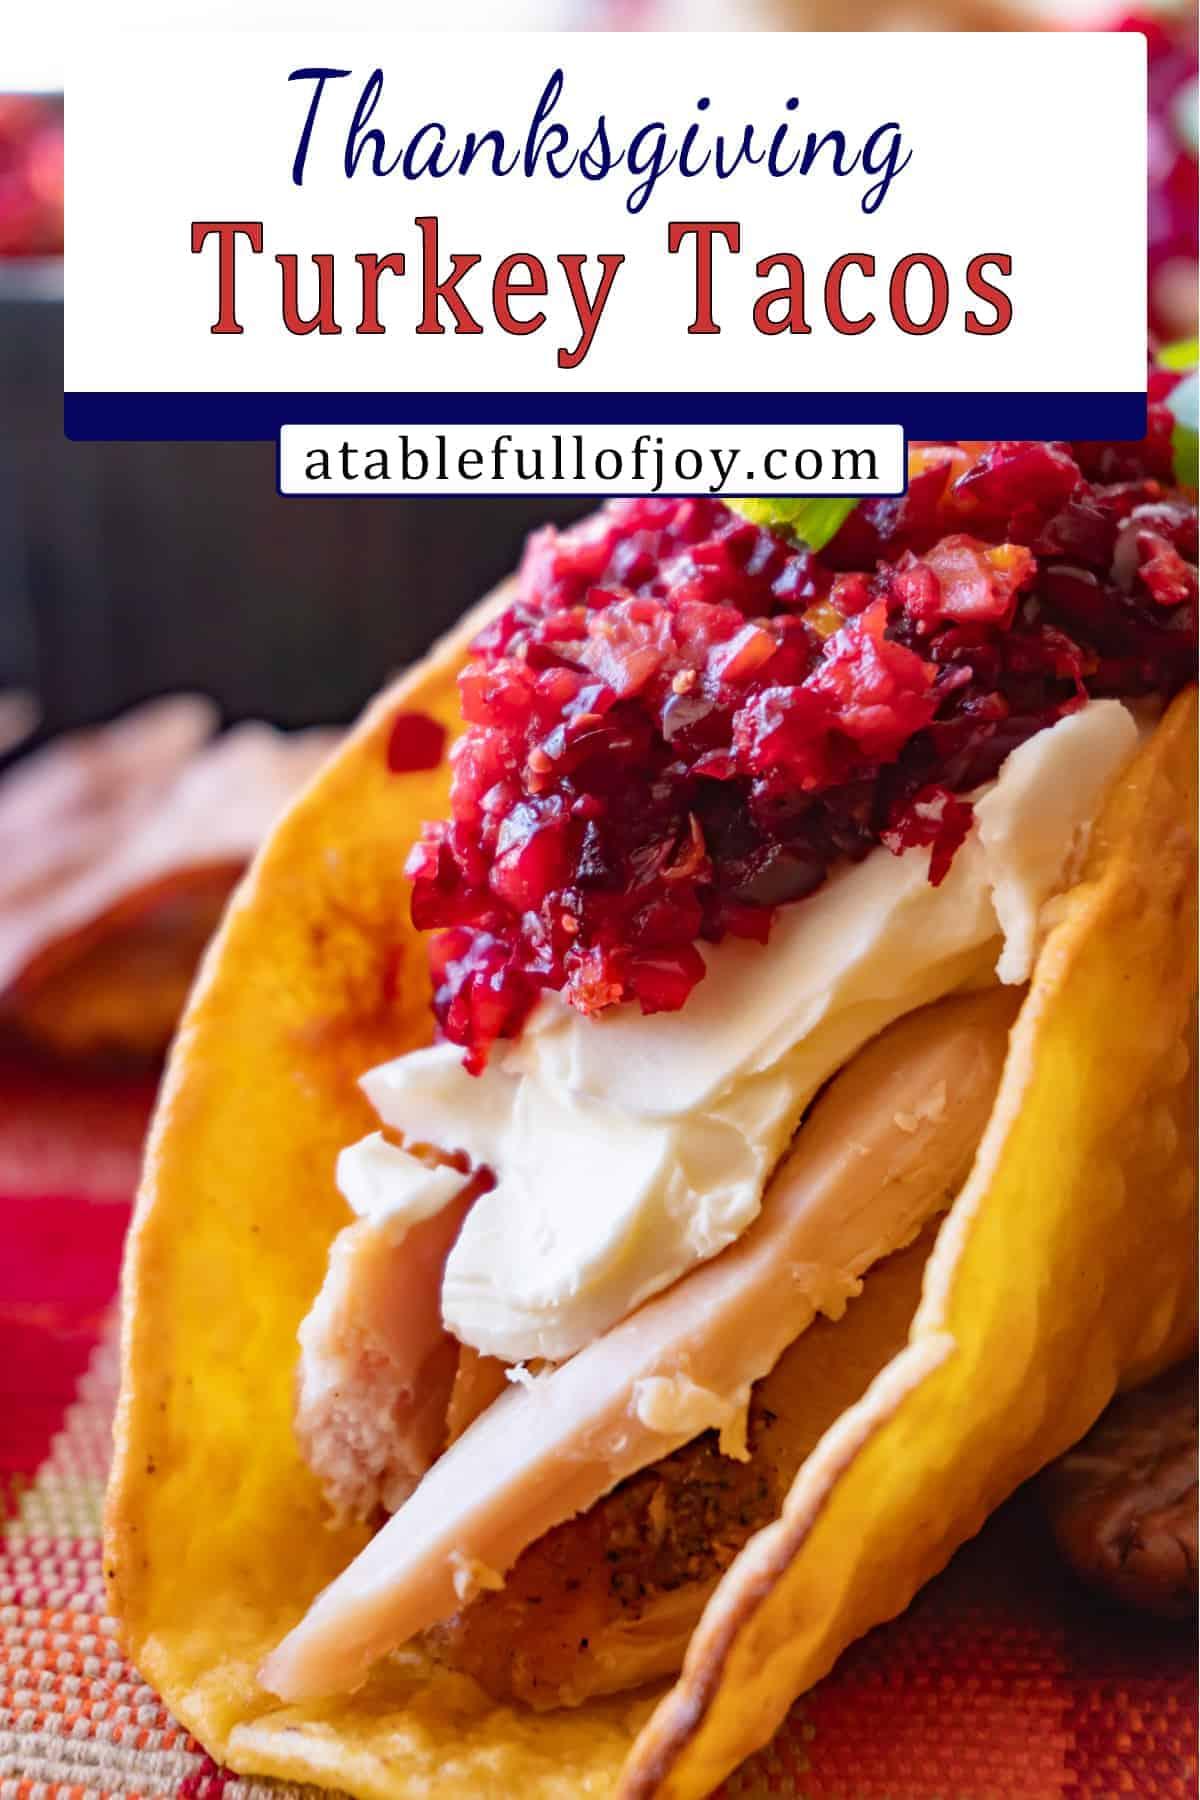 Thanksgiving Turkey Taco Pinterest Pin